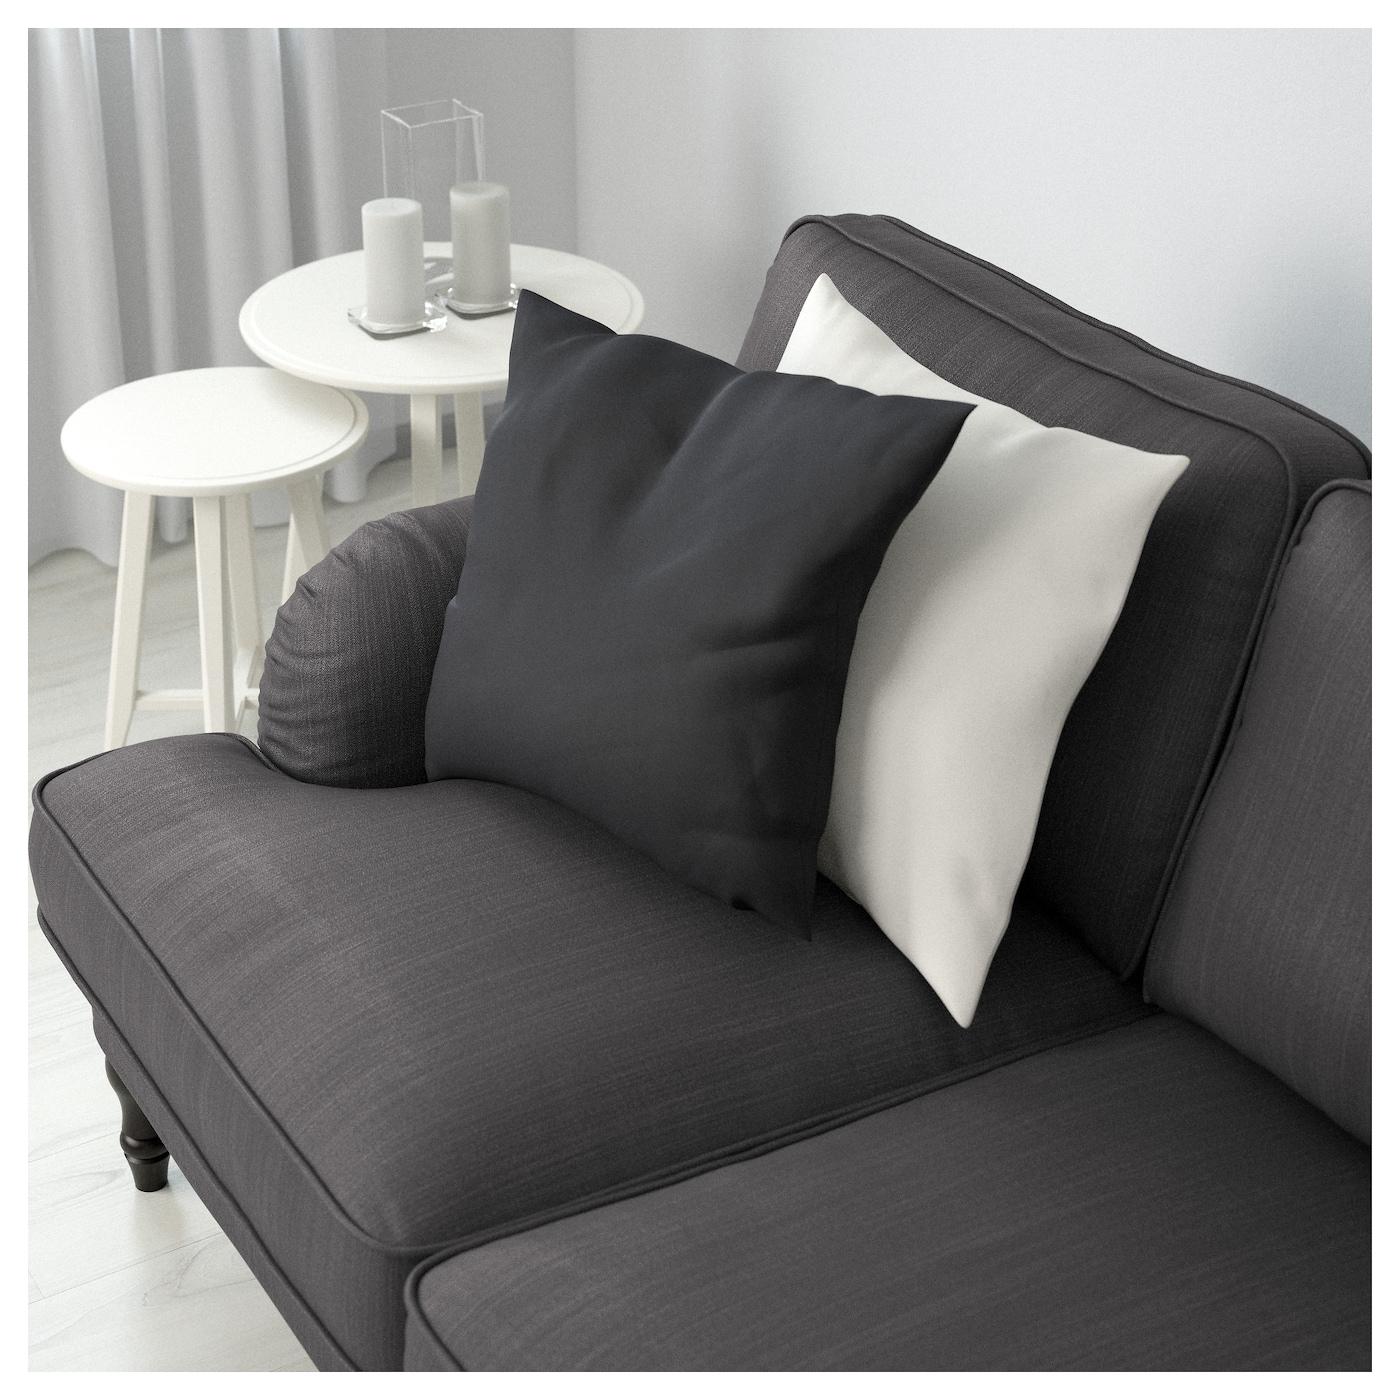 Swayde Blue Ikea Sofa: STOCKSUND Two-seat Sofa Nolhaga Dark Grey/black/wood